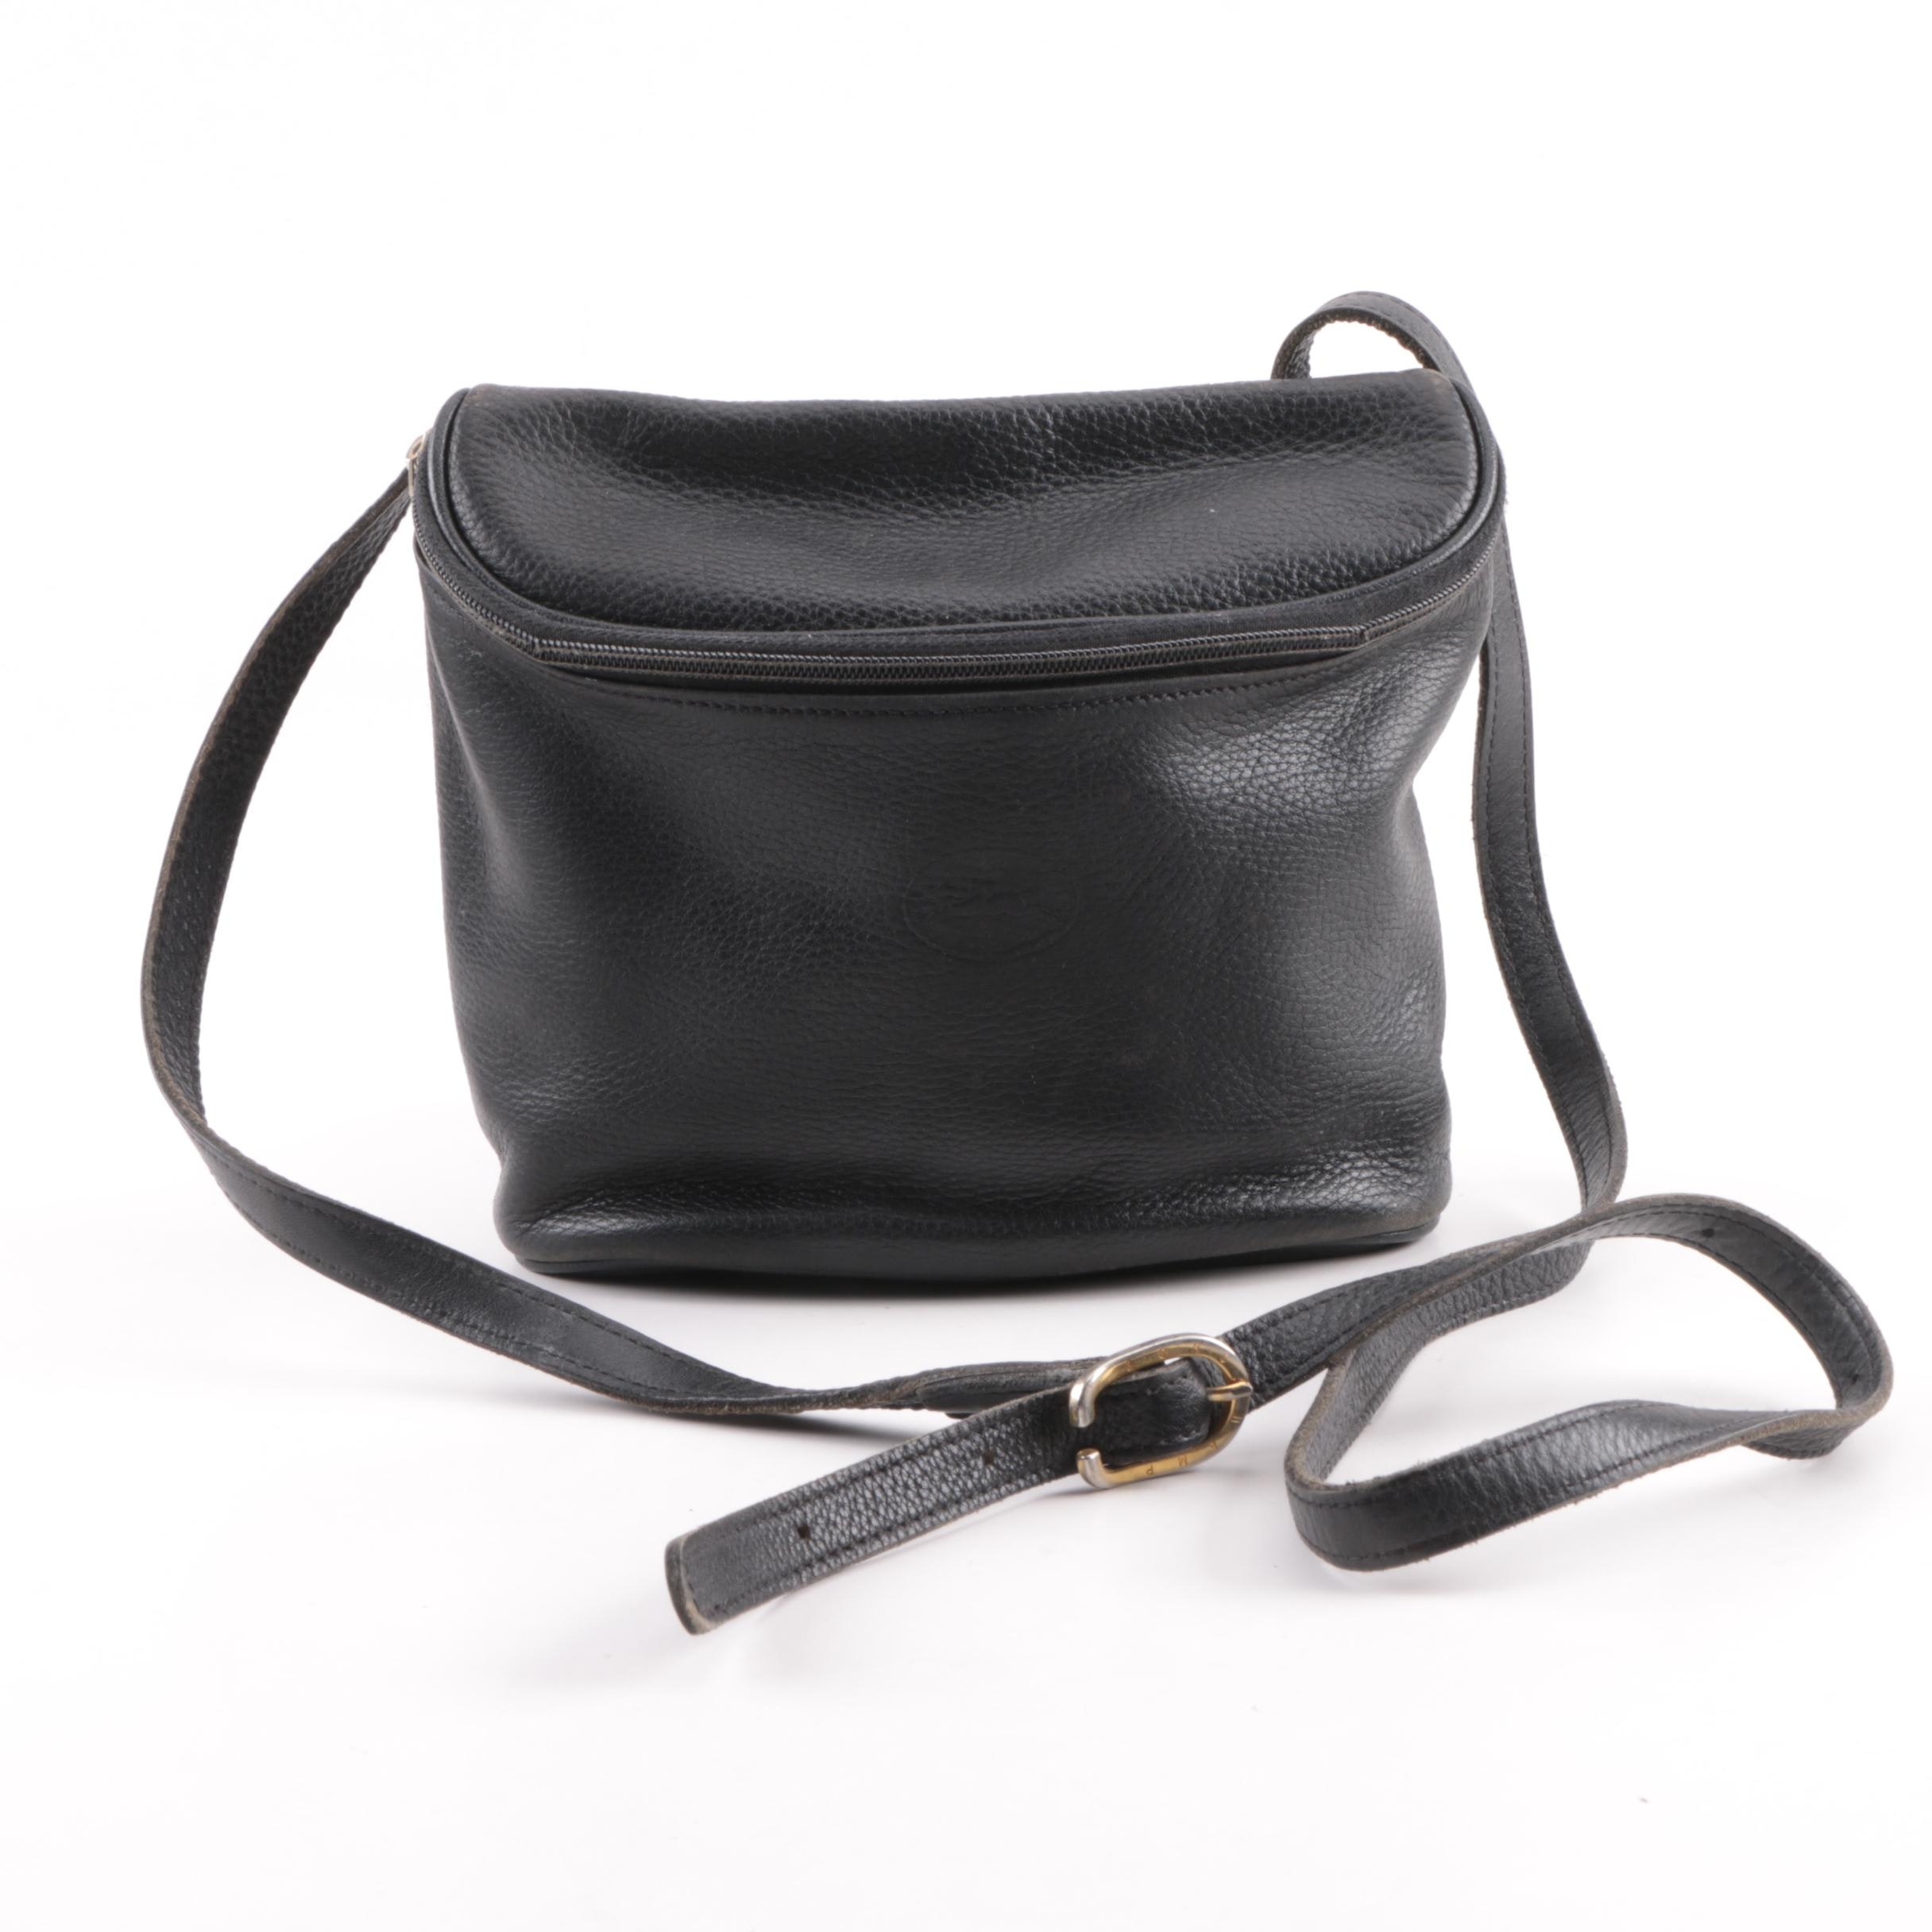 Vintage Longchamp Black Pebbled Leather Bucket Crossbody Bag